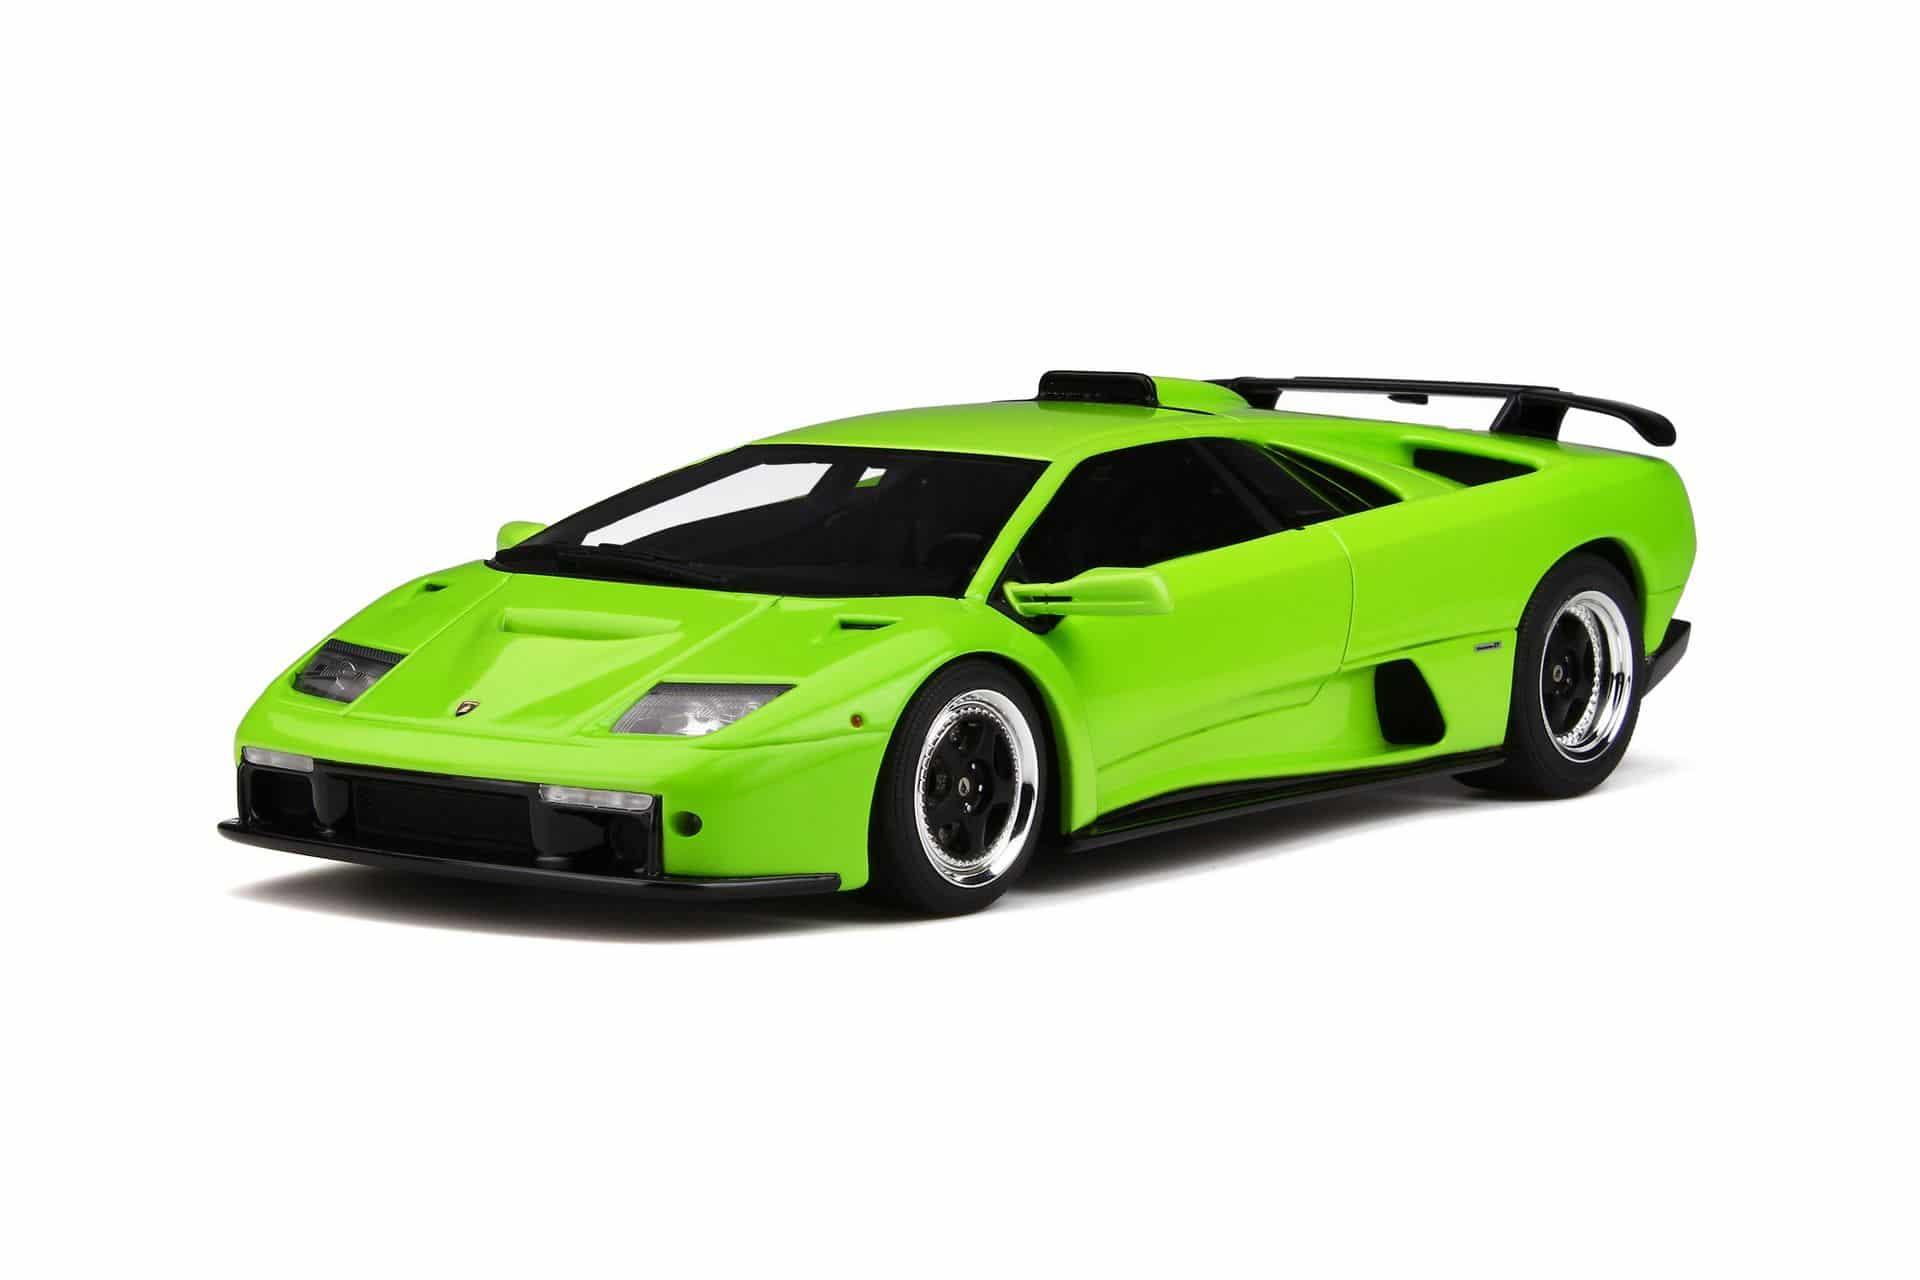 Lamborghini Diablo Gt 1 18 Gt Spirit Gts18507gr Modelkars